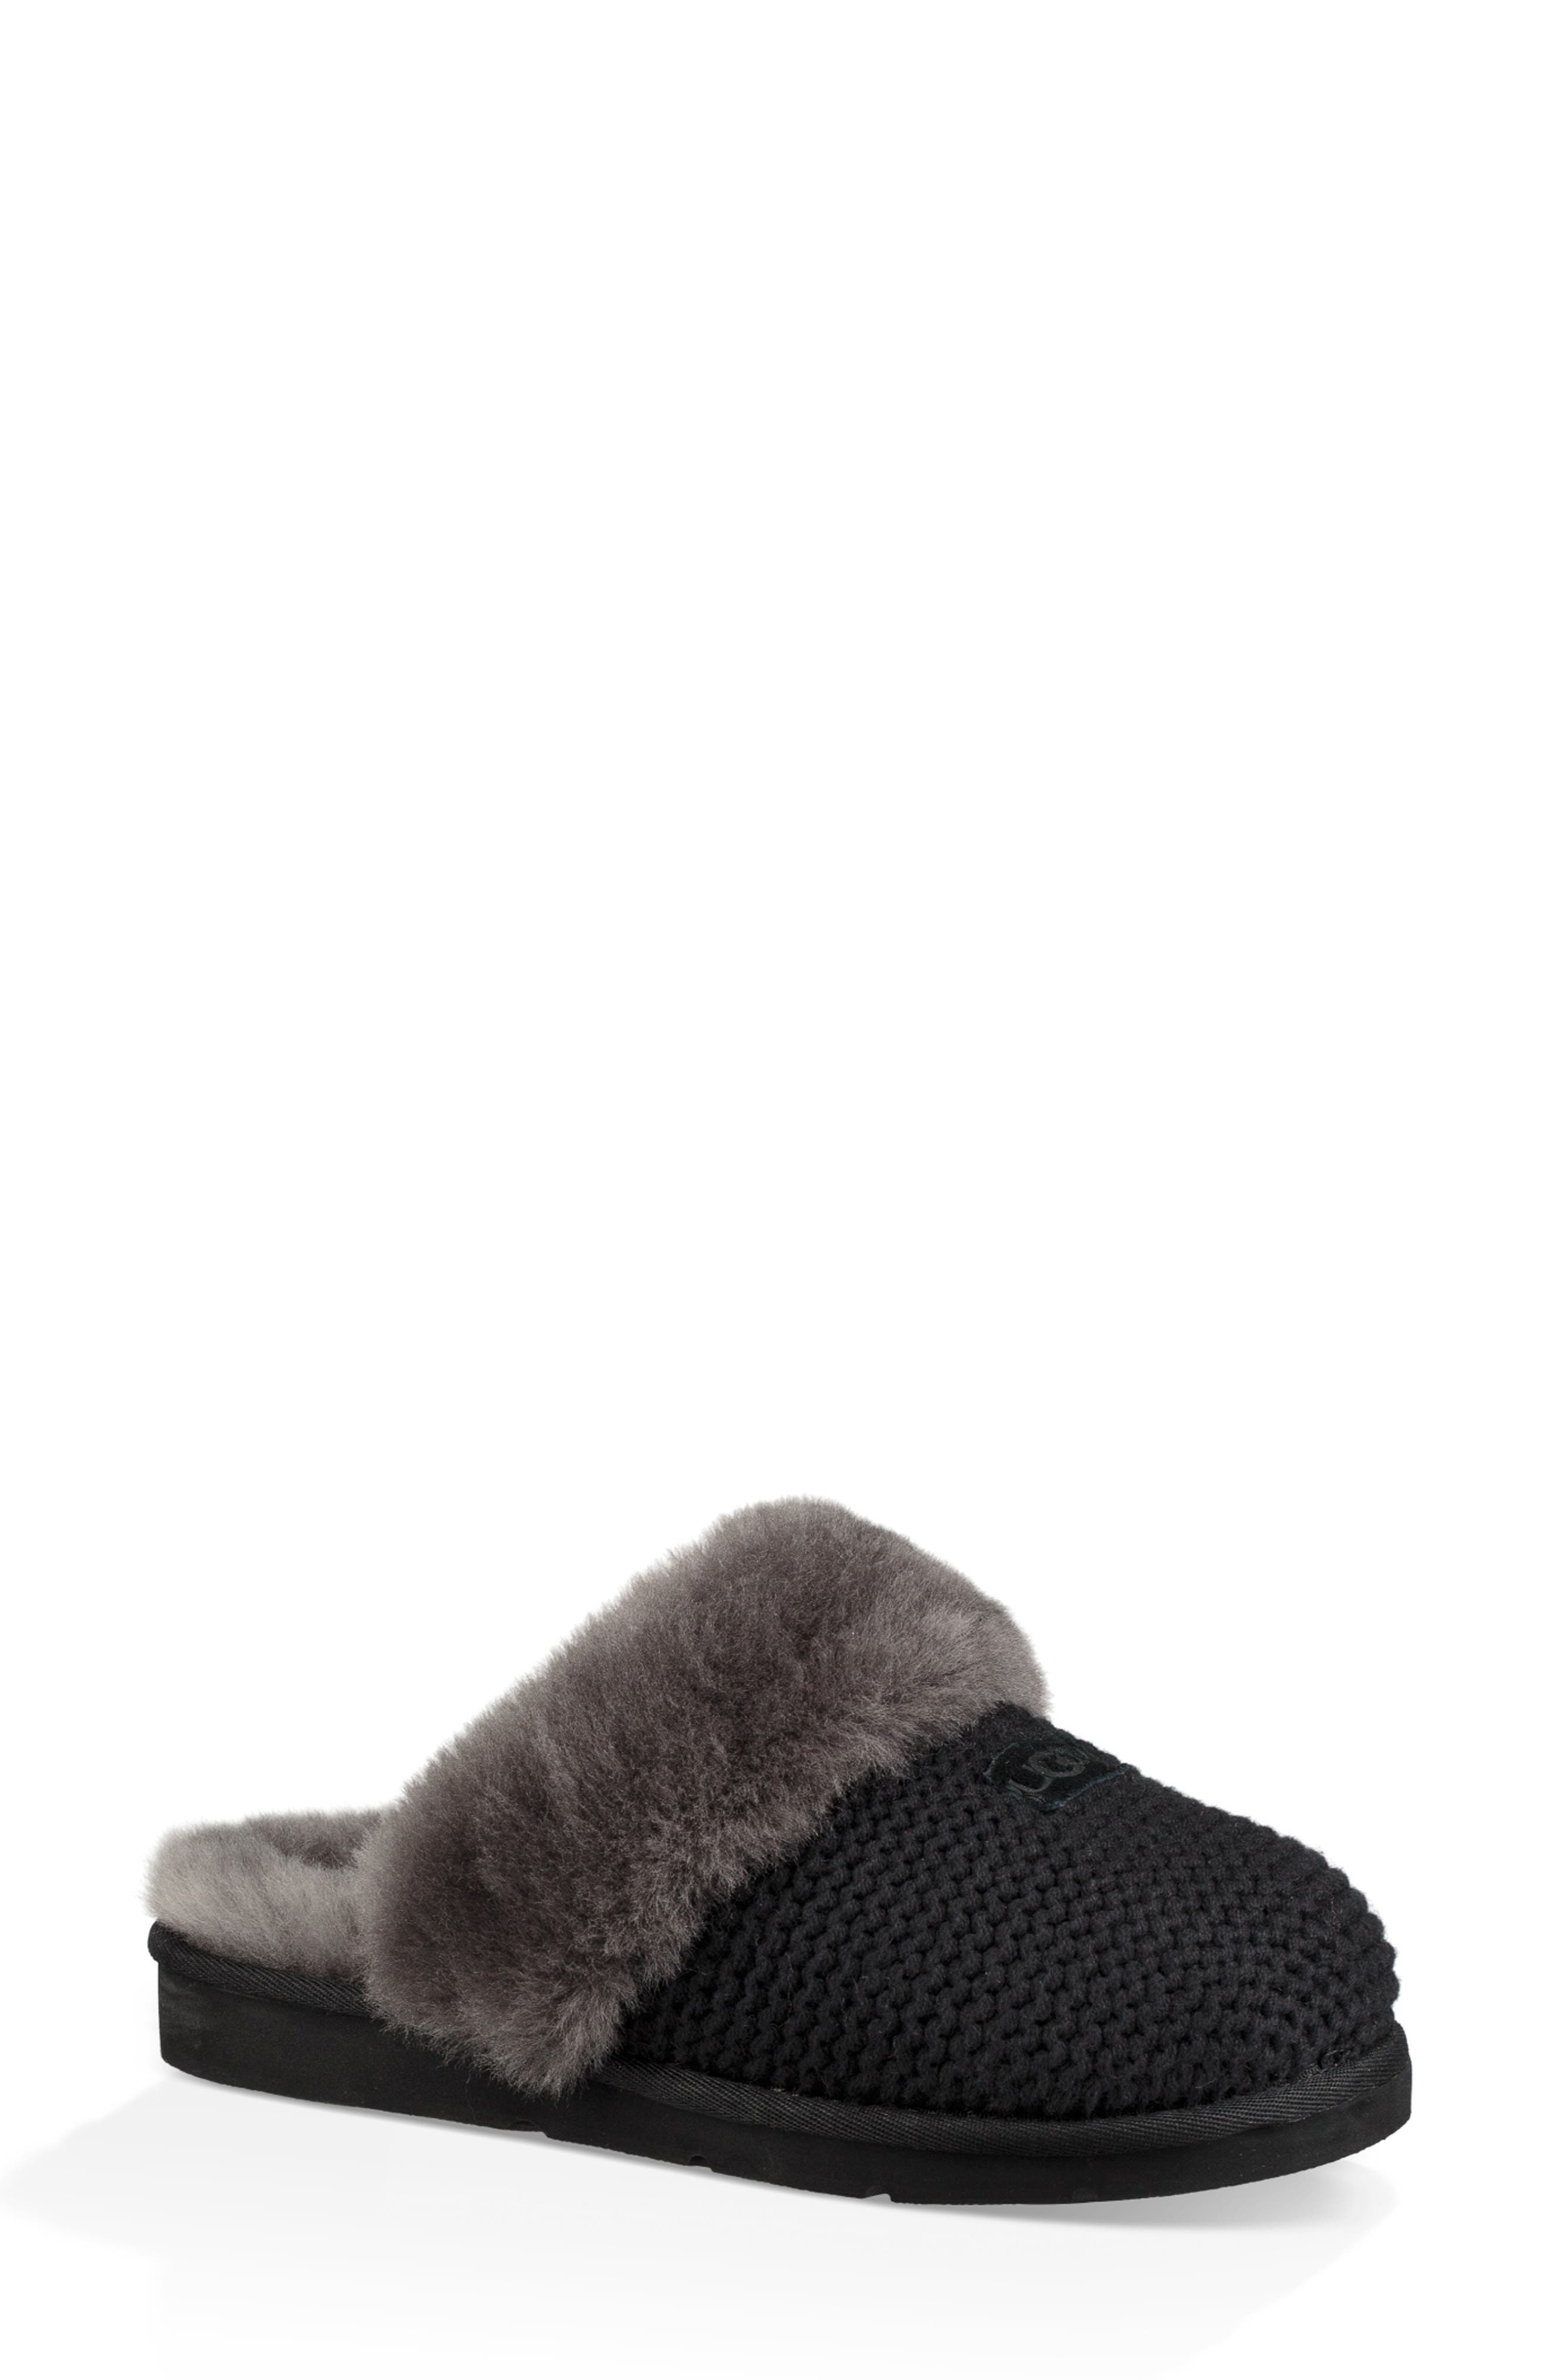 Cozy Knit Genuine Shearling Slipper,                         Main,                         color, BLACK